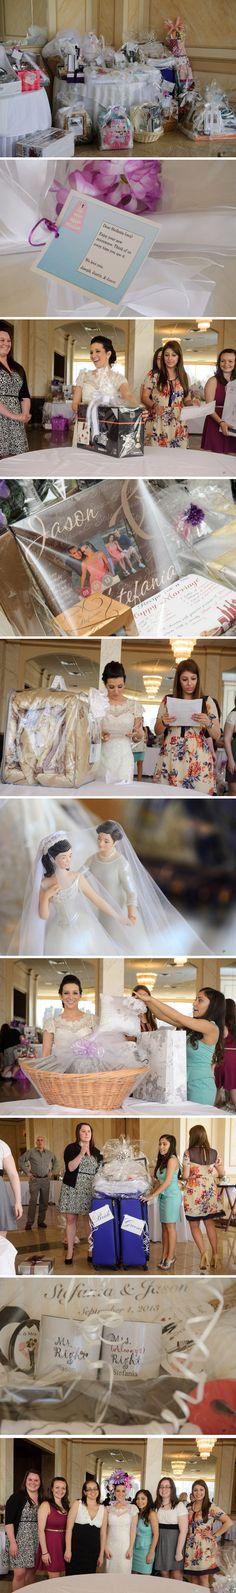 102 Best Bridal Shower Gift Ideas Images On Pinterest Gift Ideas